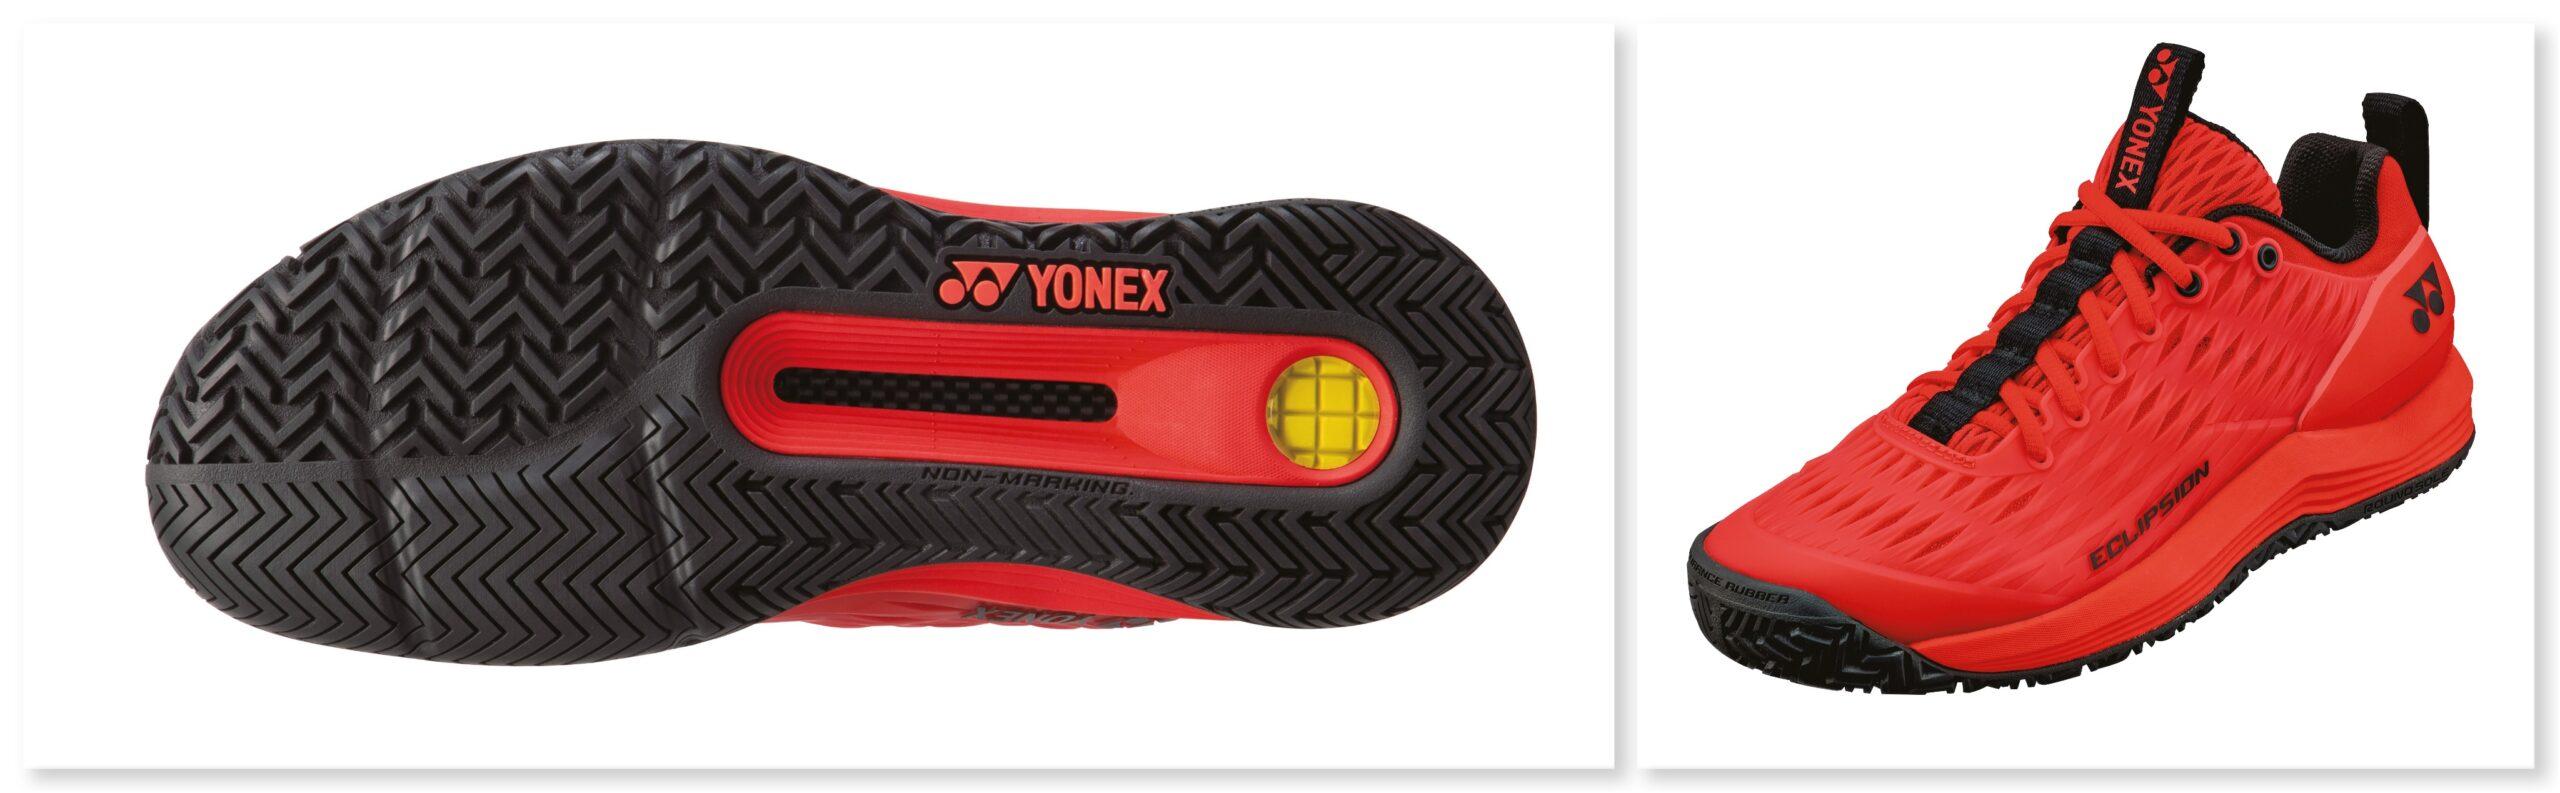 Yonex Power Cushion Eclipsion 3